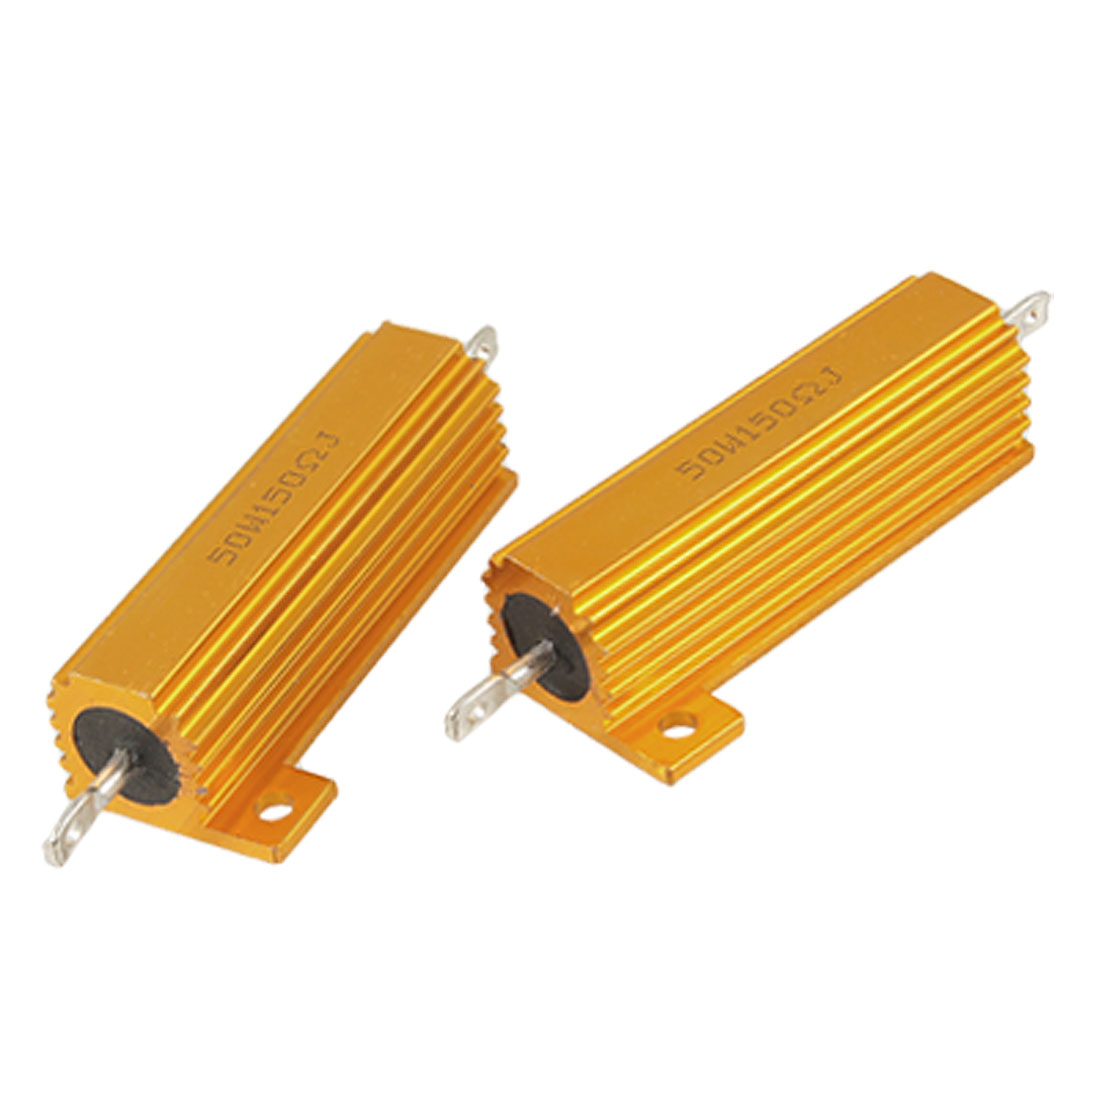 2 Pcs Screw Tabs Mounted 5% 150 Ohm Aluminum Resistors